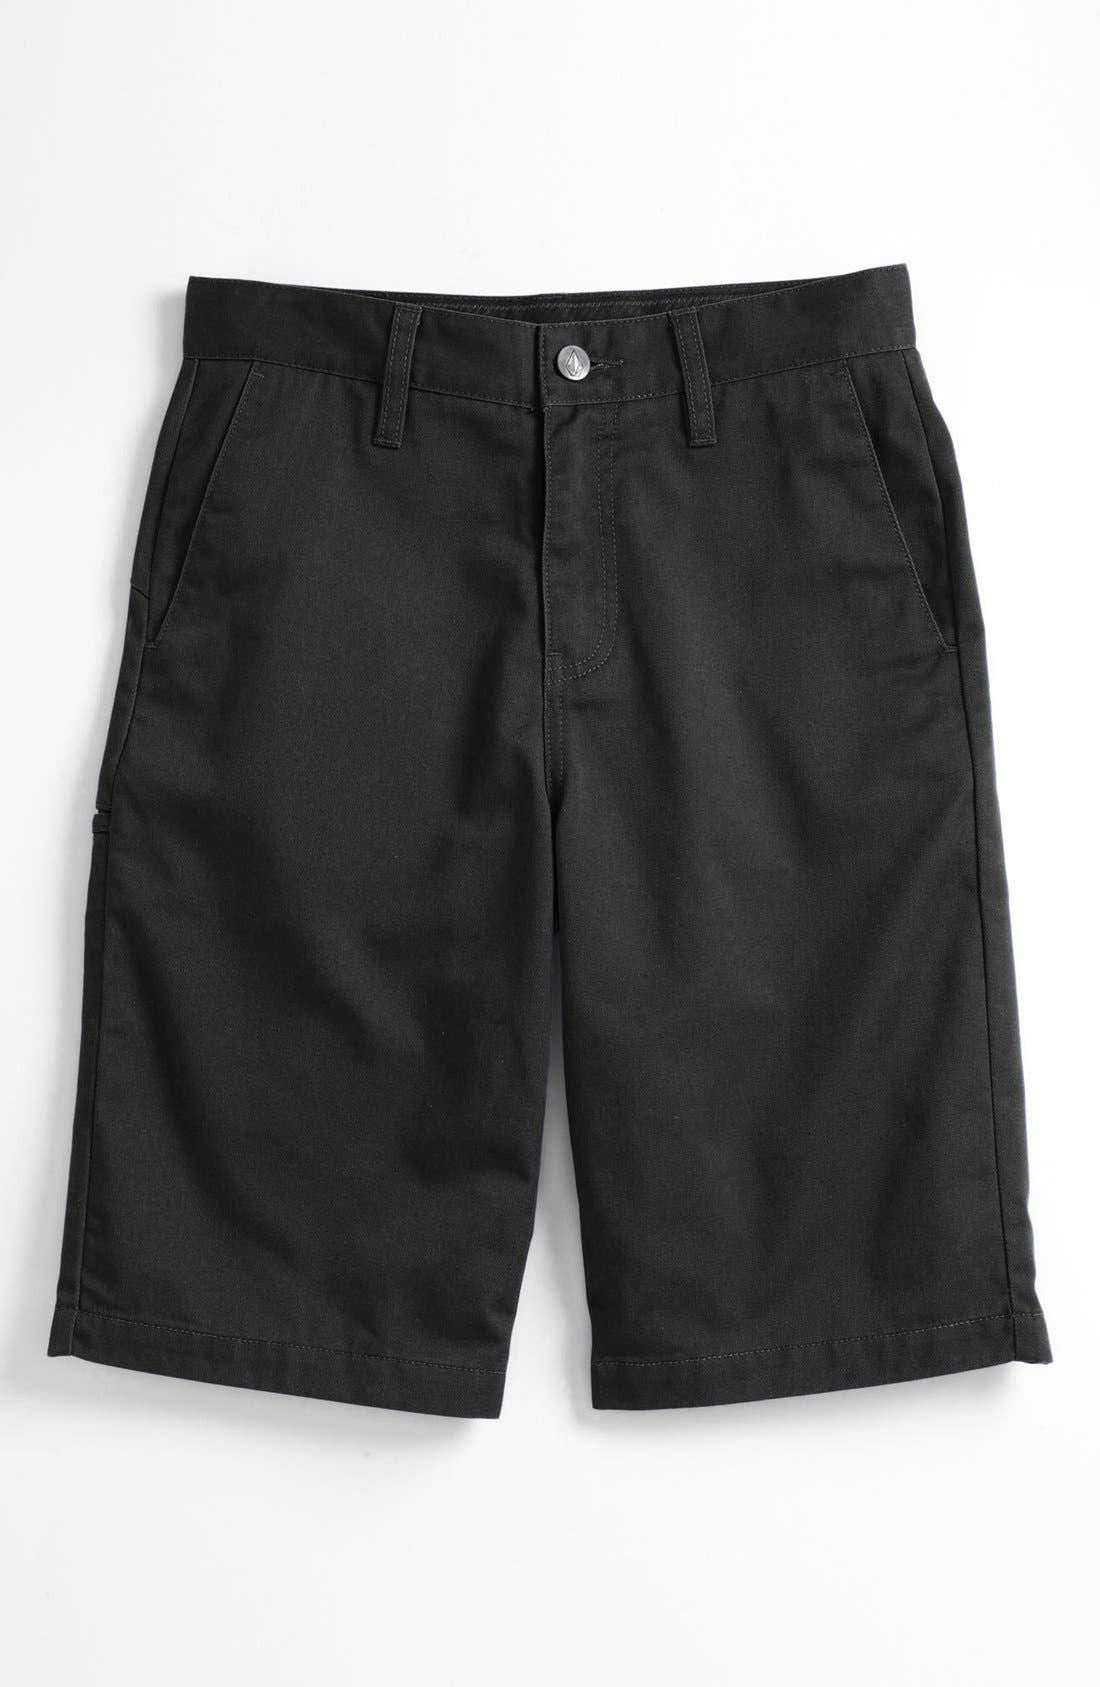 Alternate Image 1 Selected - Volcom 'Friendly' Chino Shorts (Big Boys)